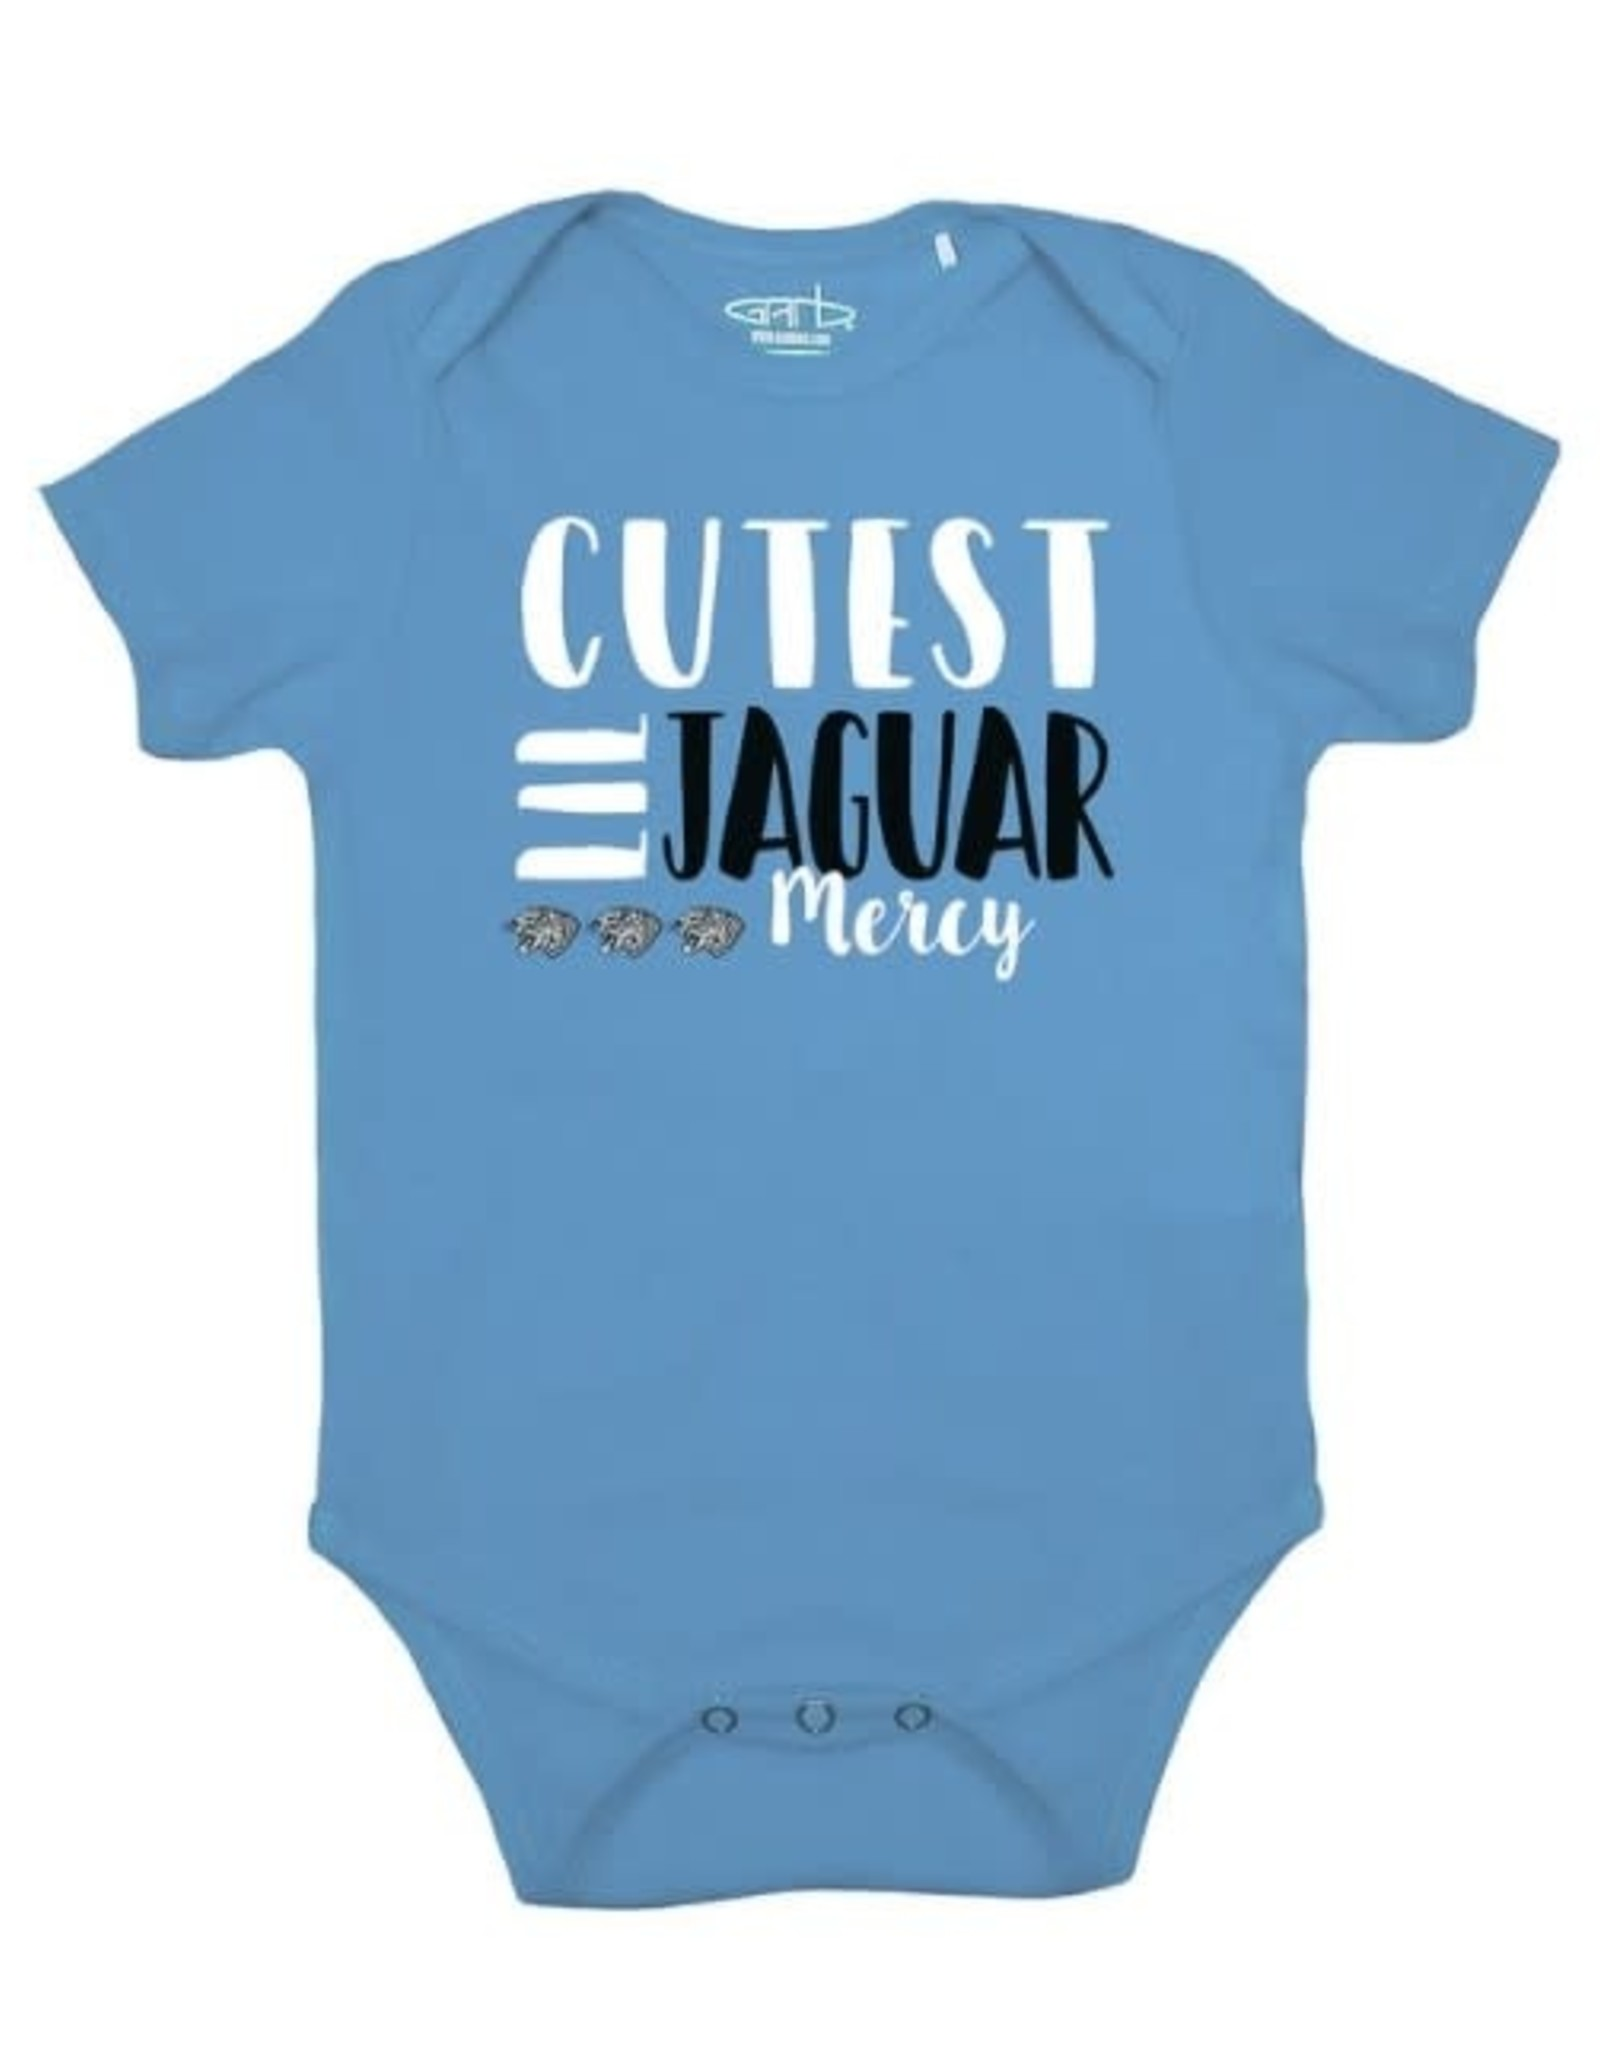 GARB INC. Mercy Infant Onesie